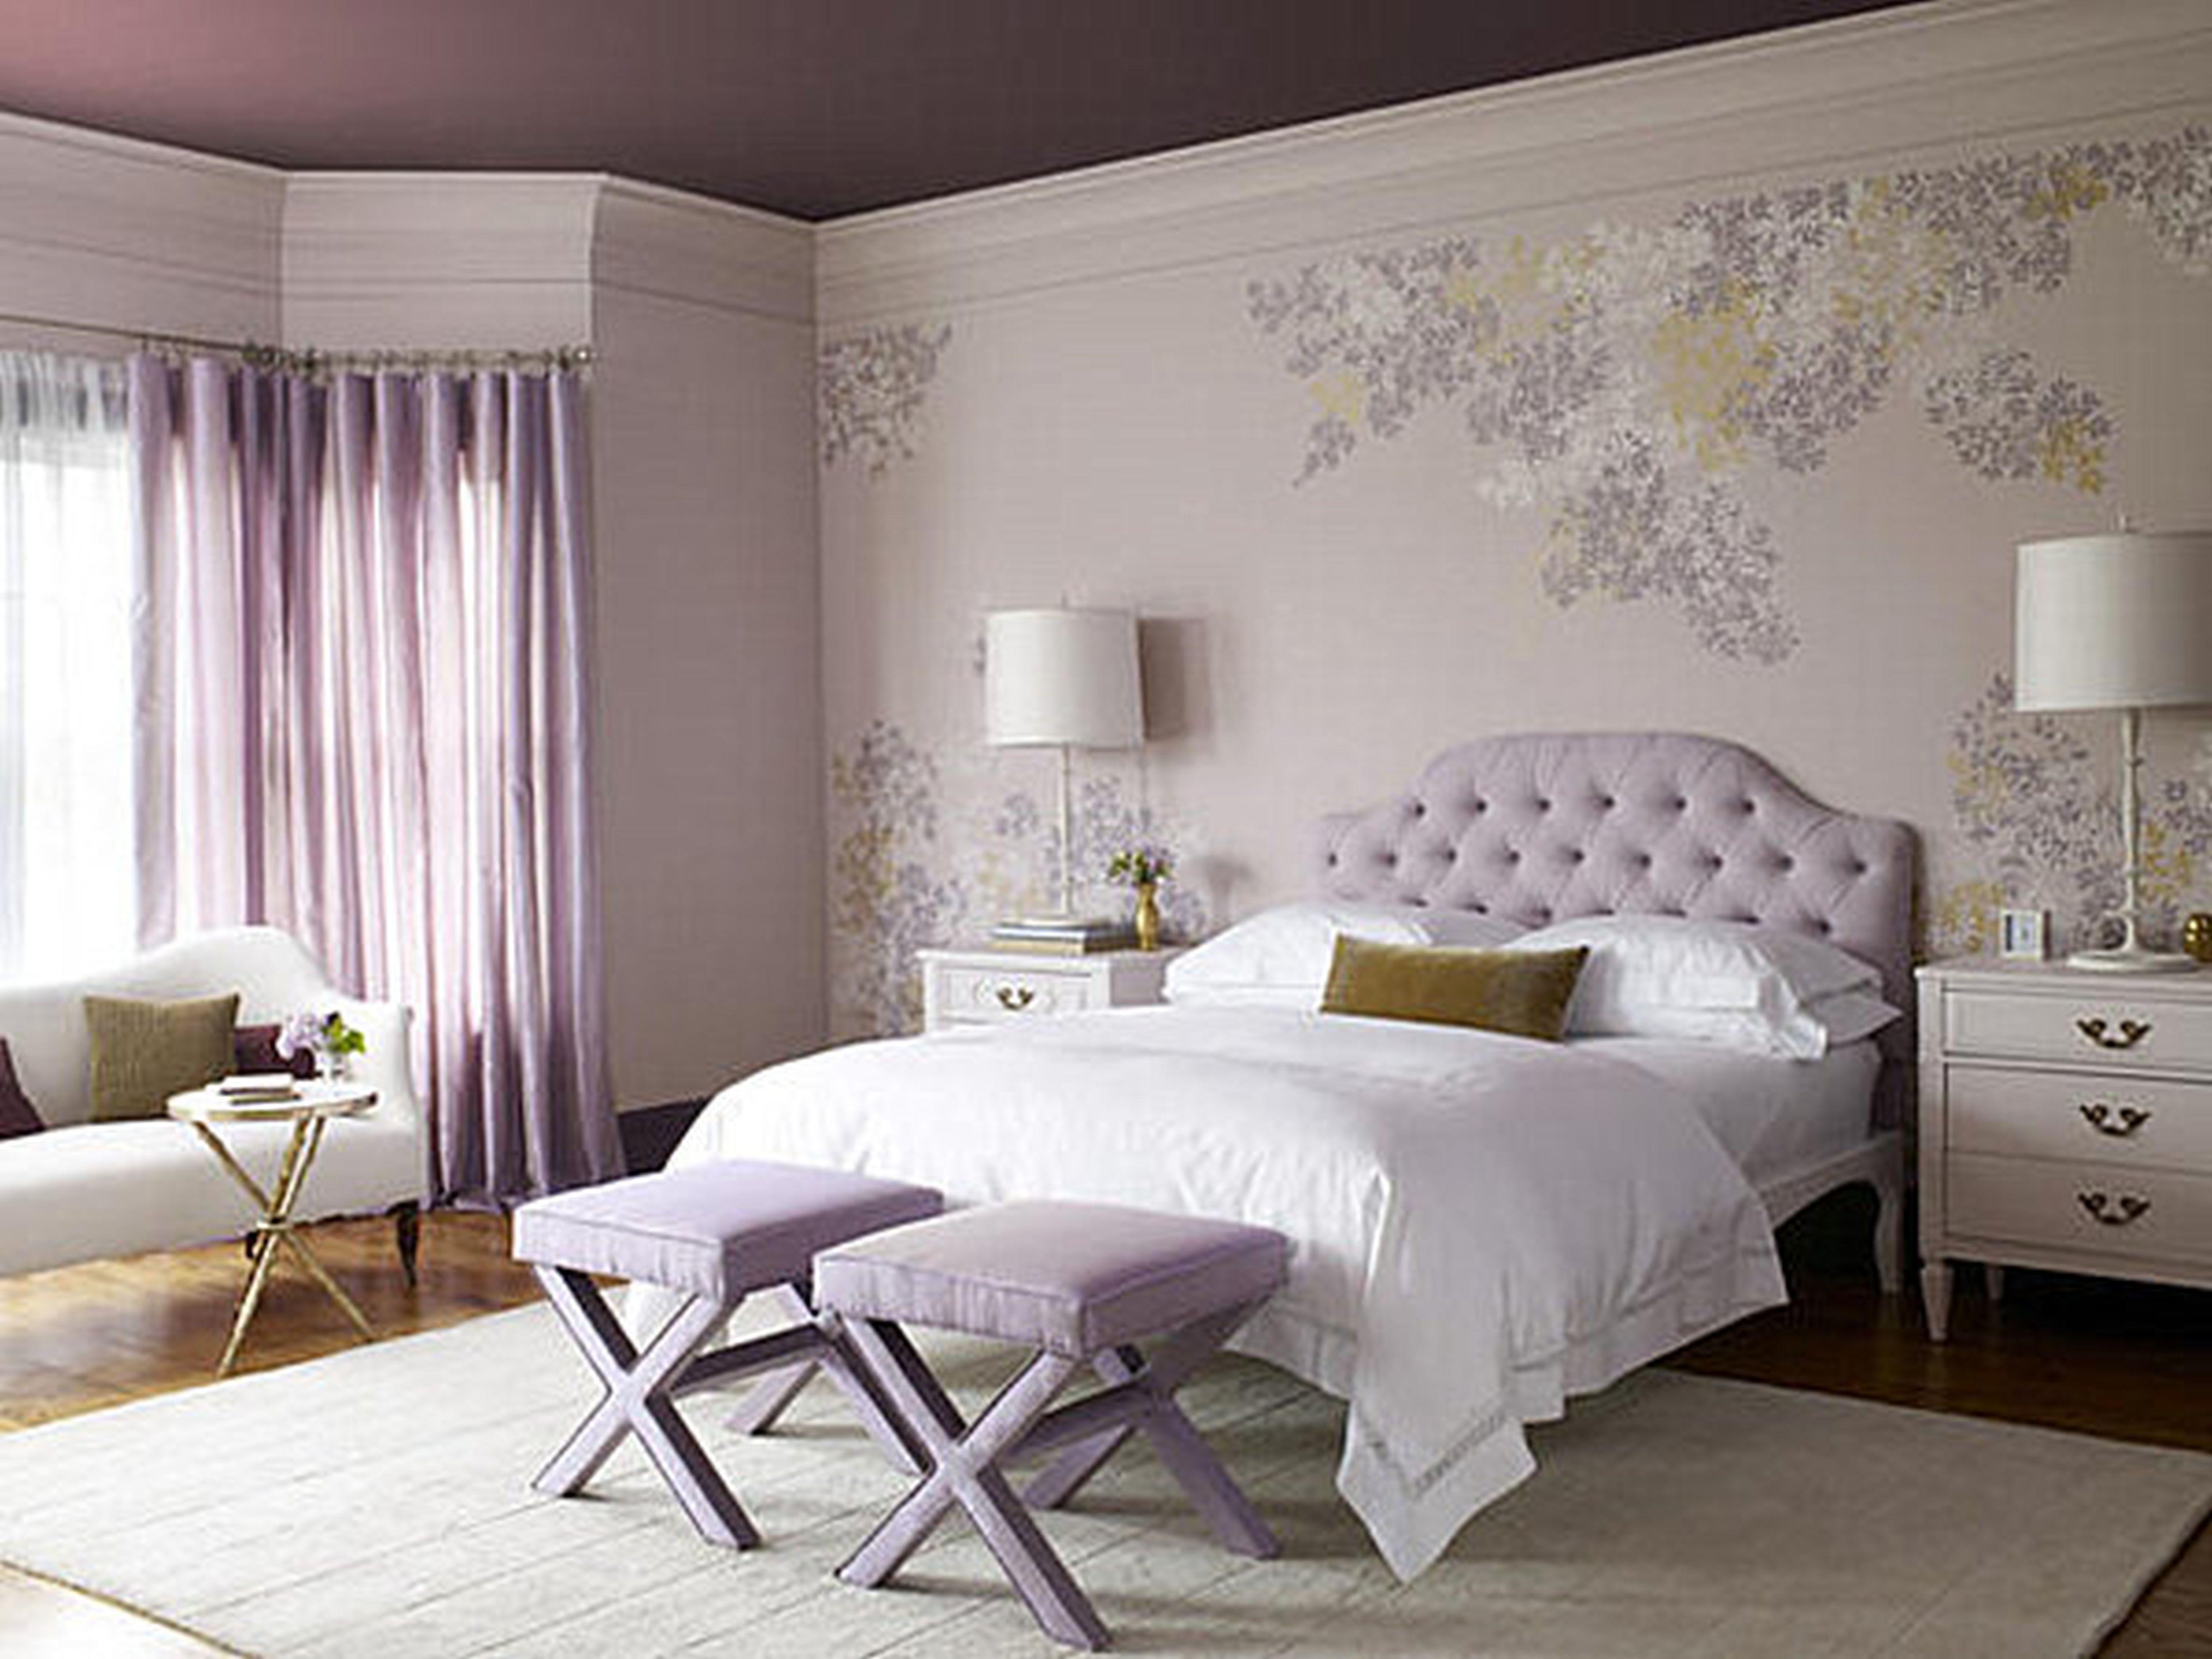 Captiviting Captiviting Elegant Bedroom Design Fancy Bedroom Elegant Bedroom